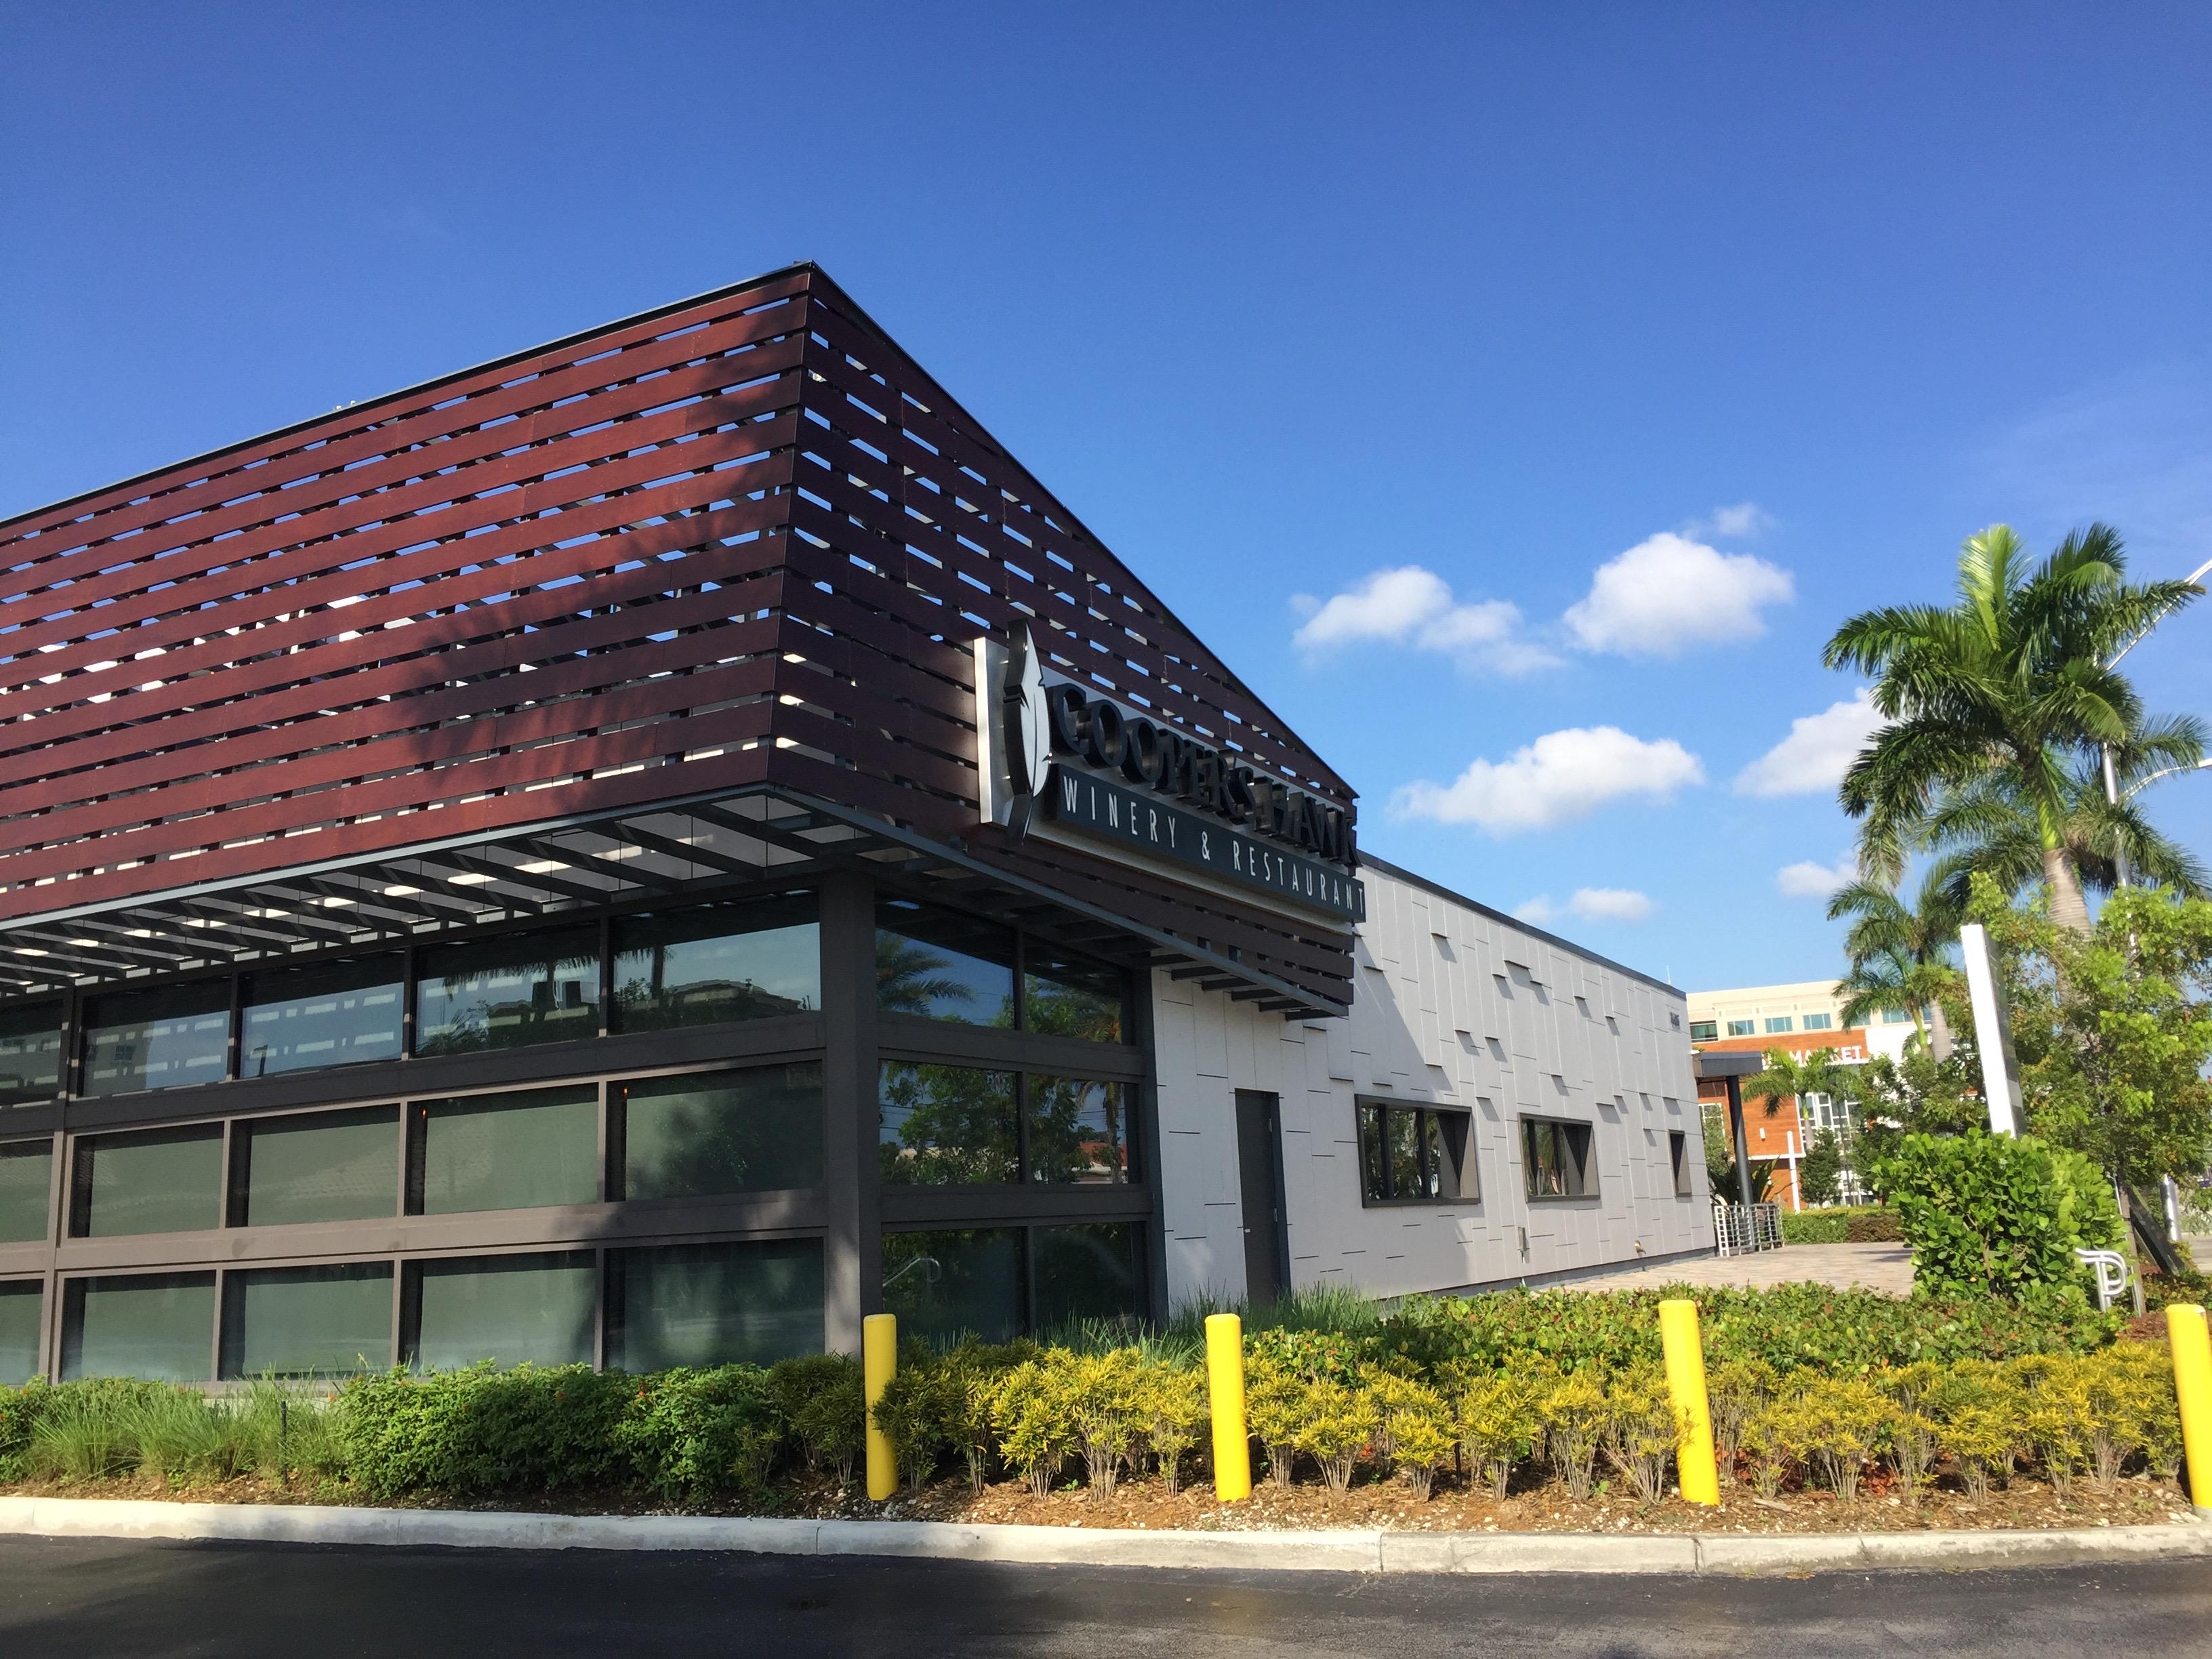 Cladding Corp Cooper's Hawk Restaurant Swisspearl Doral FL